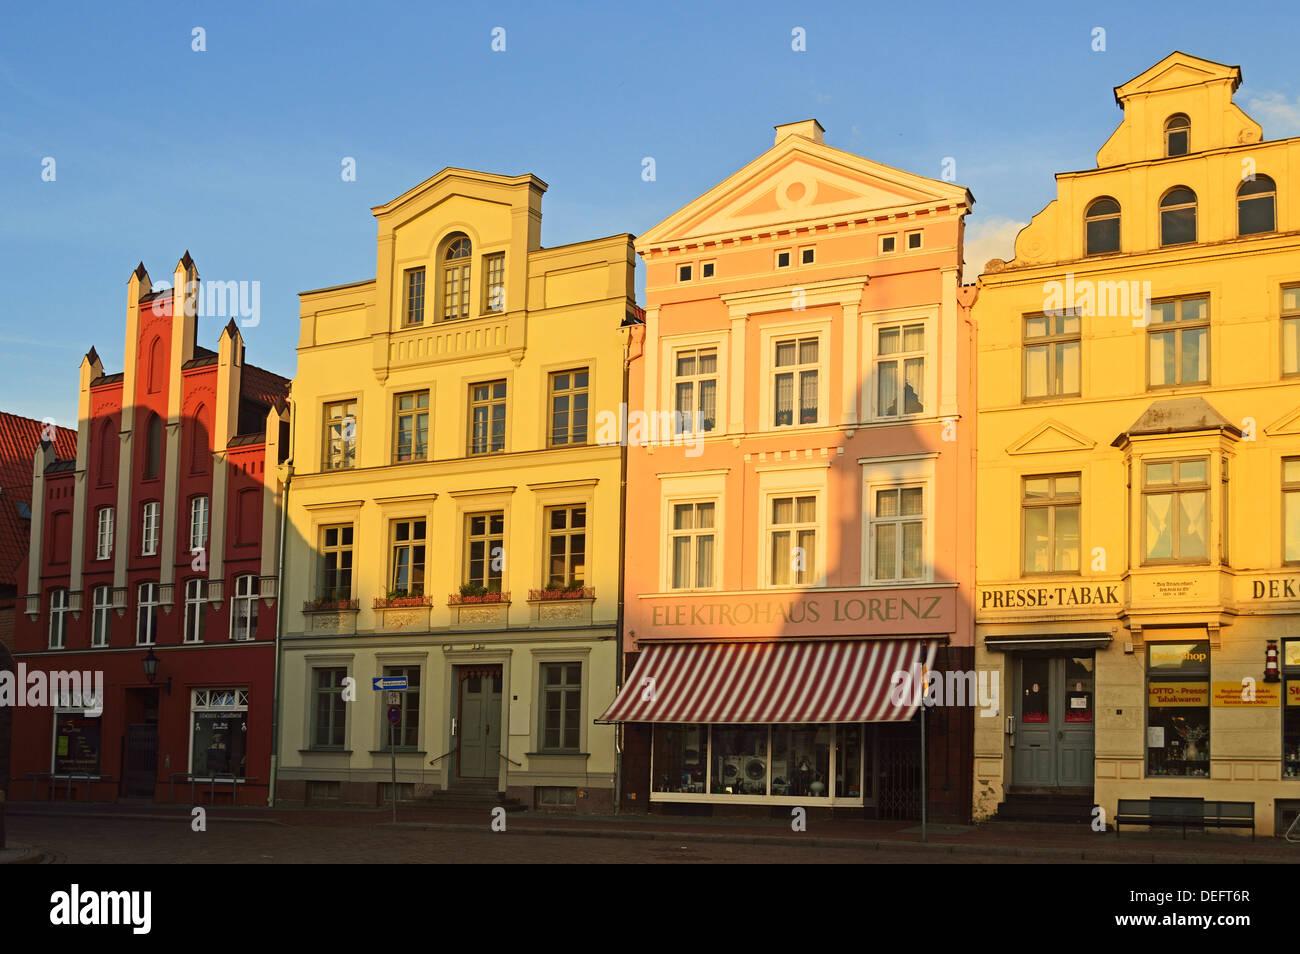 Marktplatz (market place), Wismar, UNESCO World Heritage Site, Mecklenburg-Vorpommern, Germany, Baltic Sea, Europe - Stock Image